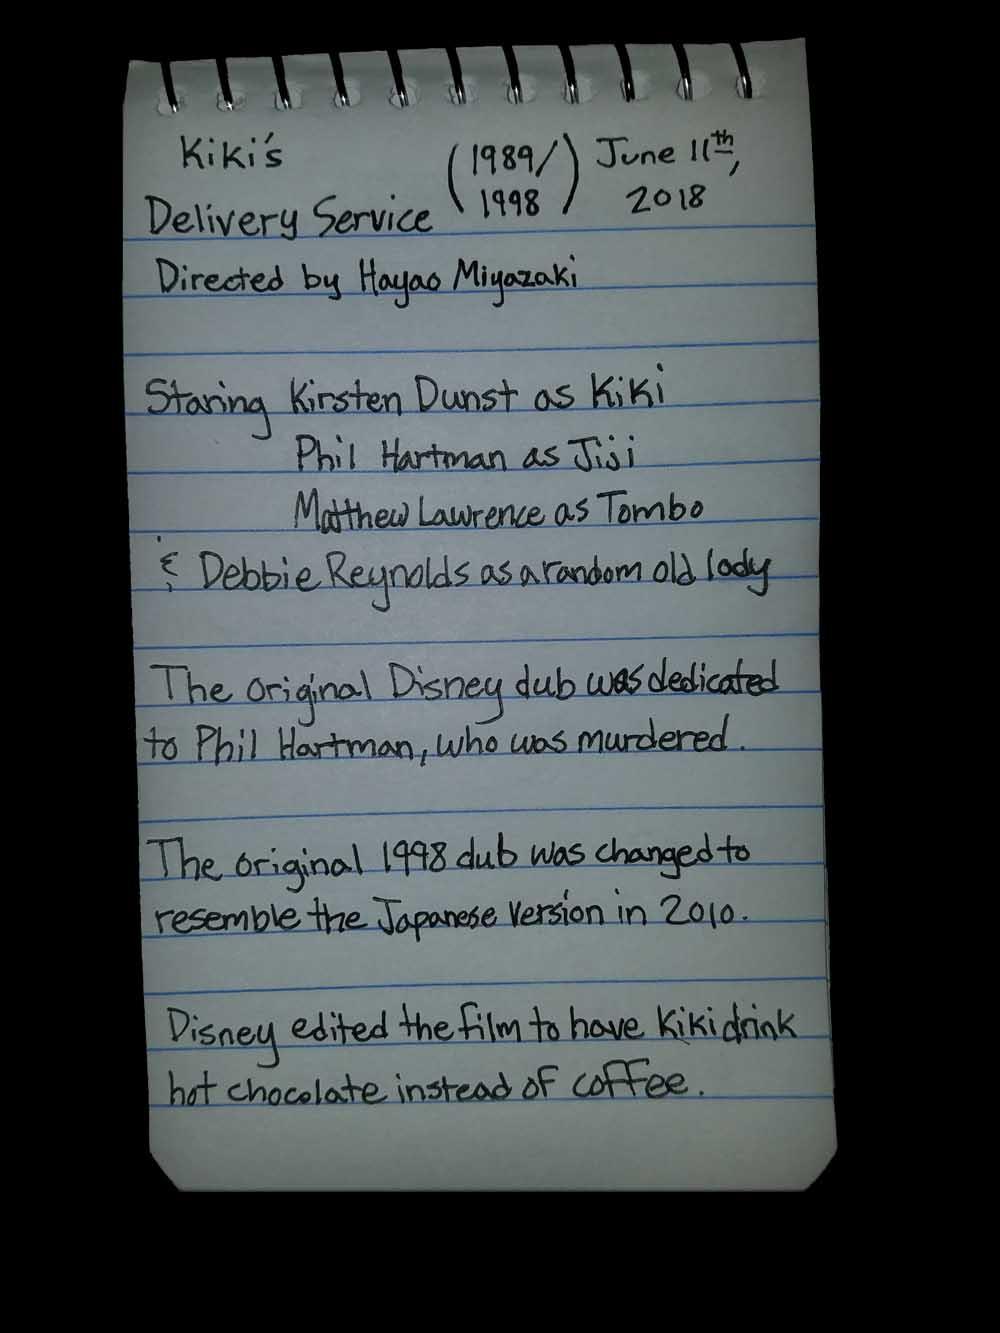 Kiki's Delivery Service, Film Notes, Trivia, Bagrisham, Brandon Grisham